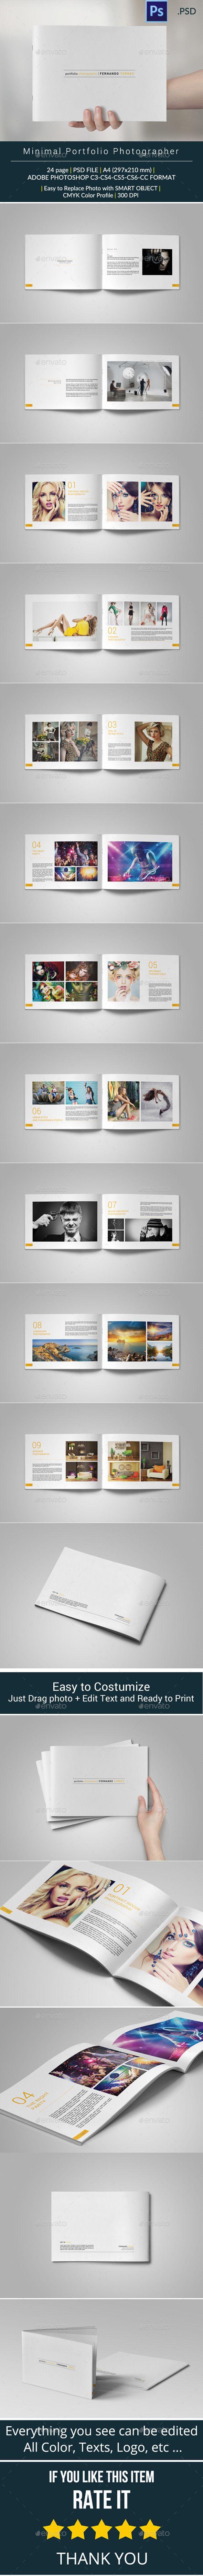 Minimal Portfolio Brochure Template #design Download: http://graphicriver.net/item/minimal-portfolio/10058402?ref=ksioks